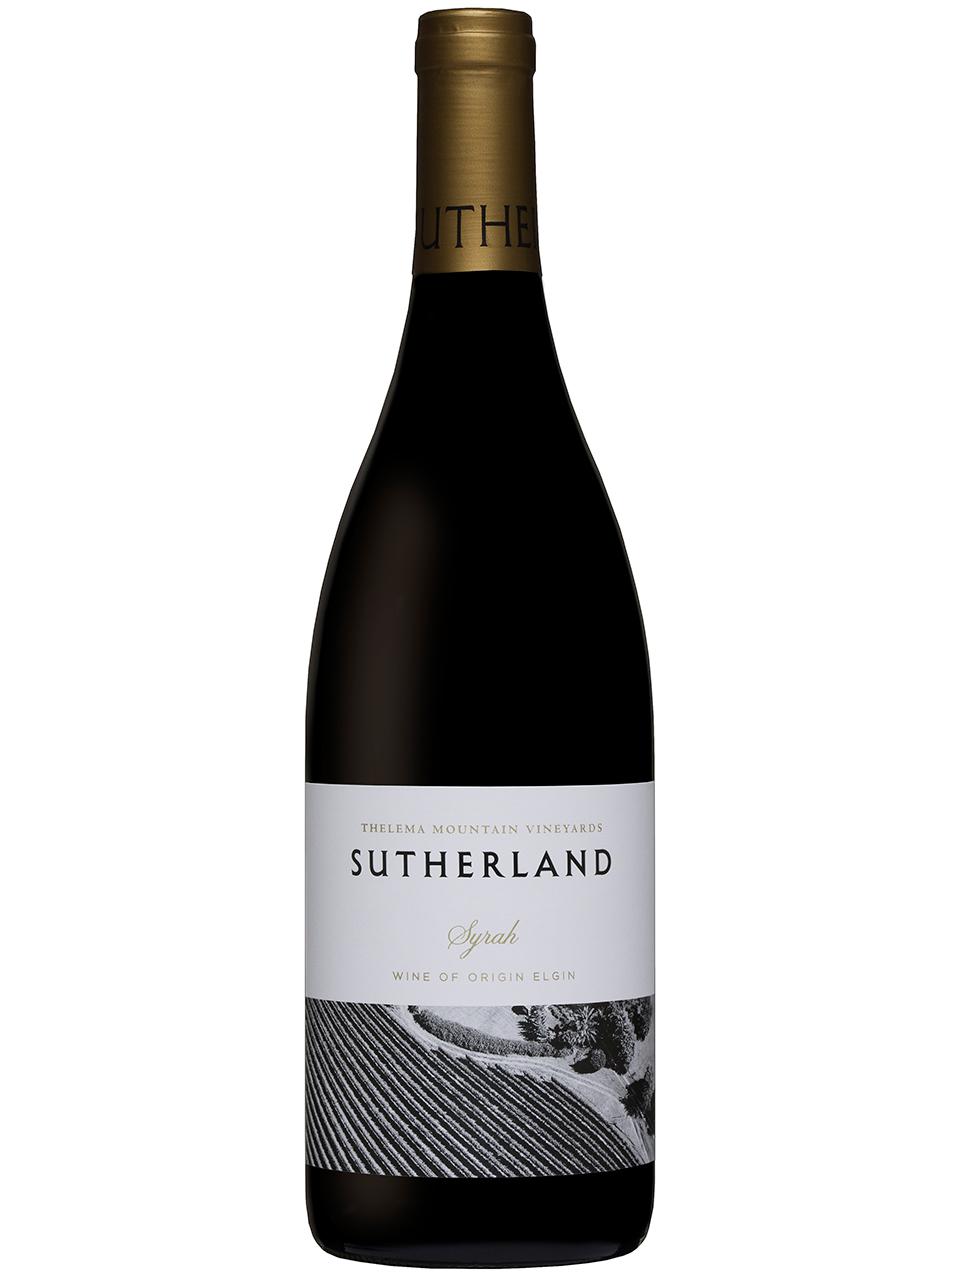 Sutherland Syrah